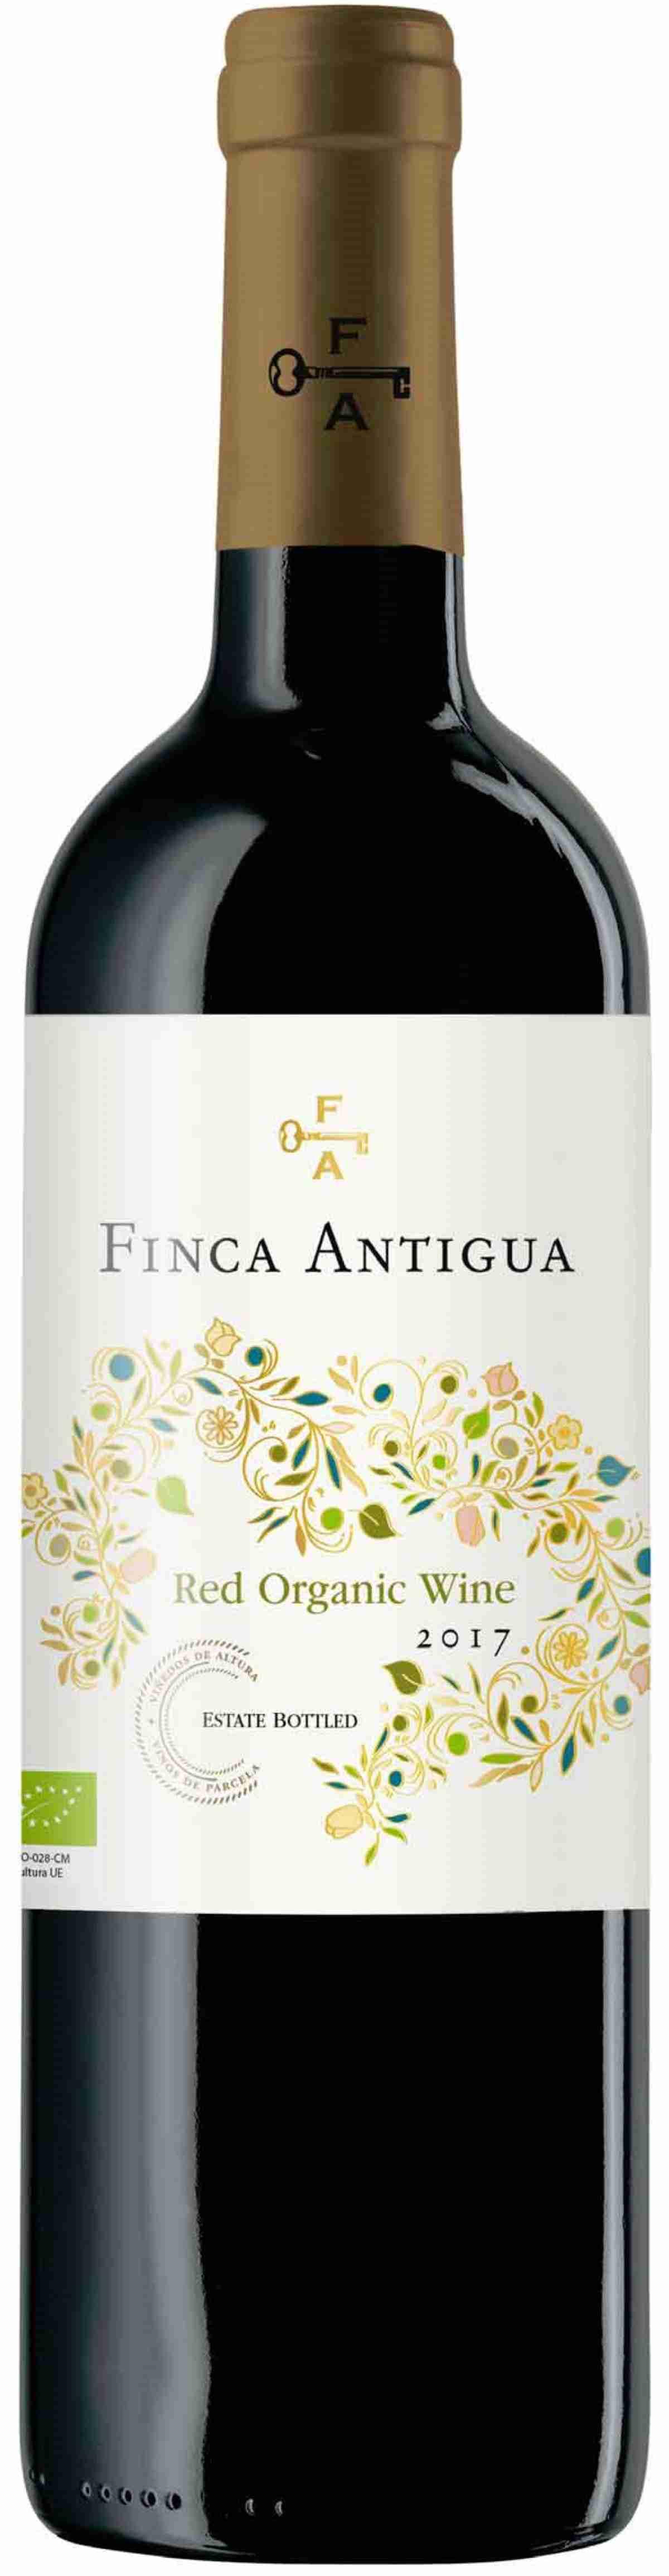 Familia Martinez Bujanda lanza Finca Antigua Orgánico 2017, su primer vino orgánico certificado 1